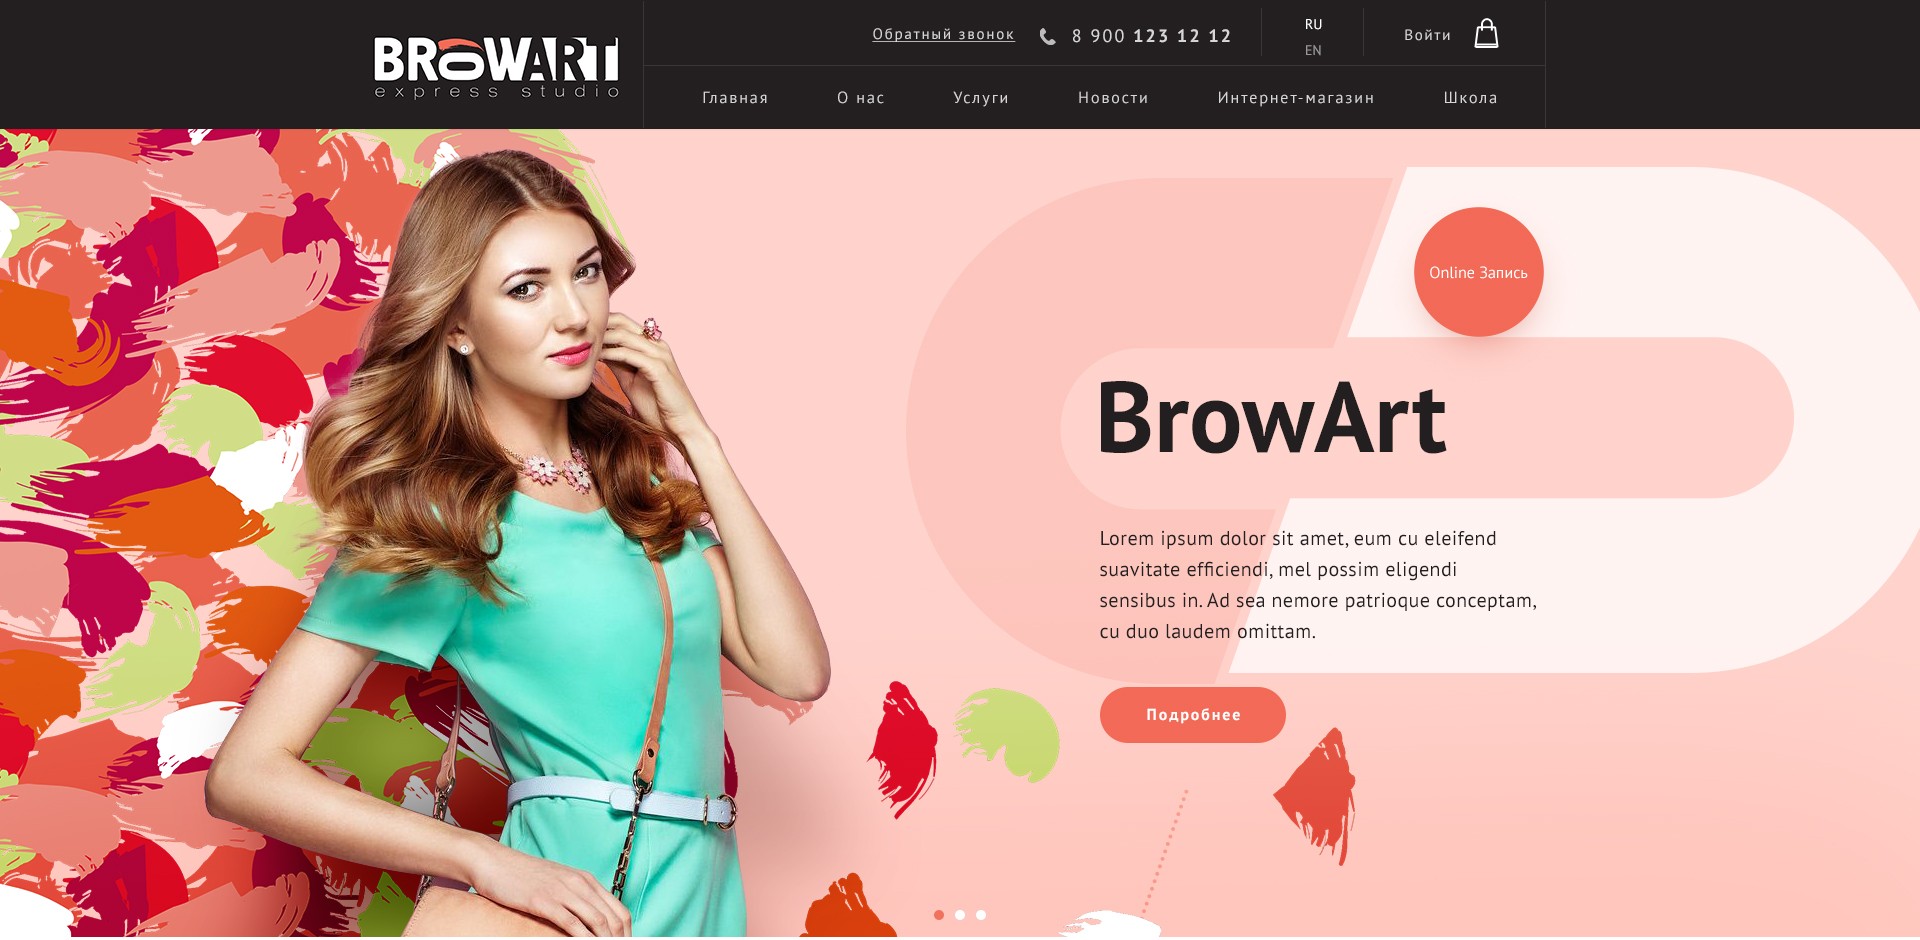 Дизайн сайта на основе готового прототипа-схемы и концепции фото f_5505a26b9d3e81c2.jpg